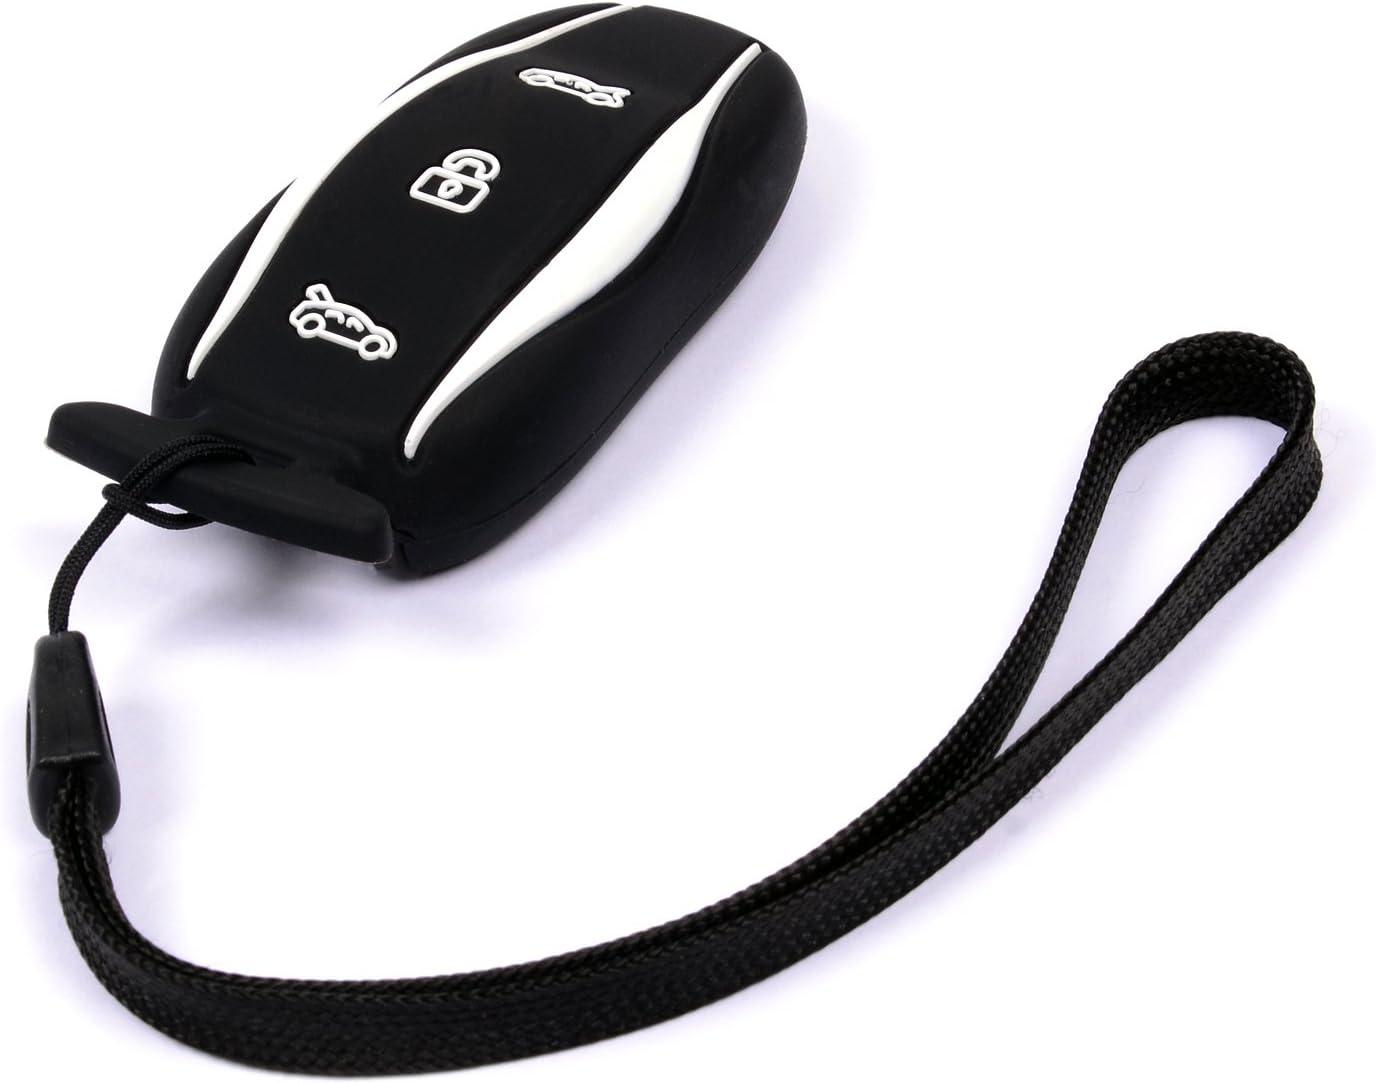 Black with Wrist Strap Velsman Car Smart Key Fob Silicone Case Cover Protector Holder Skin for Tesla Model S